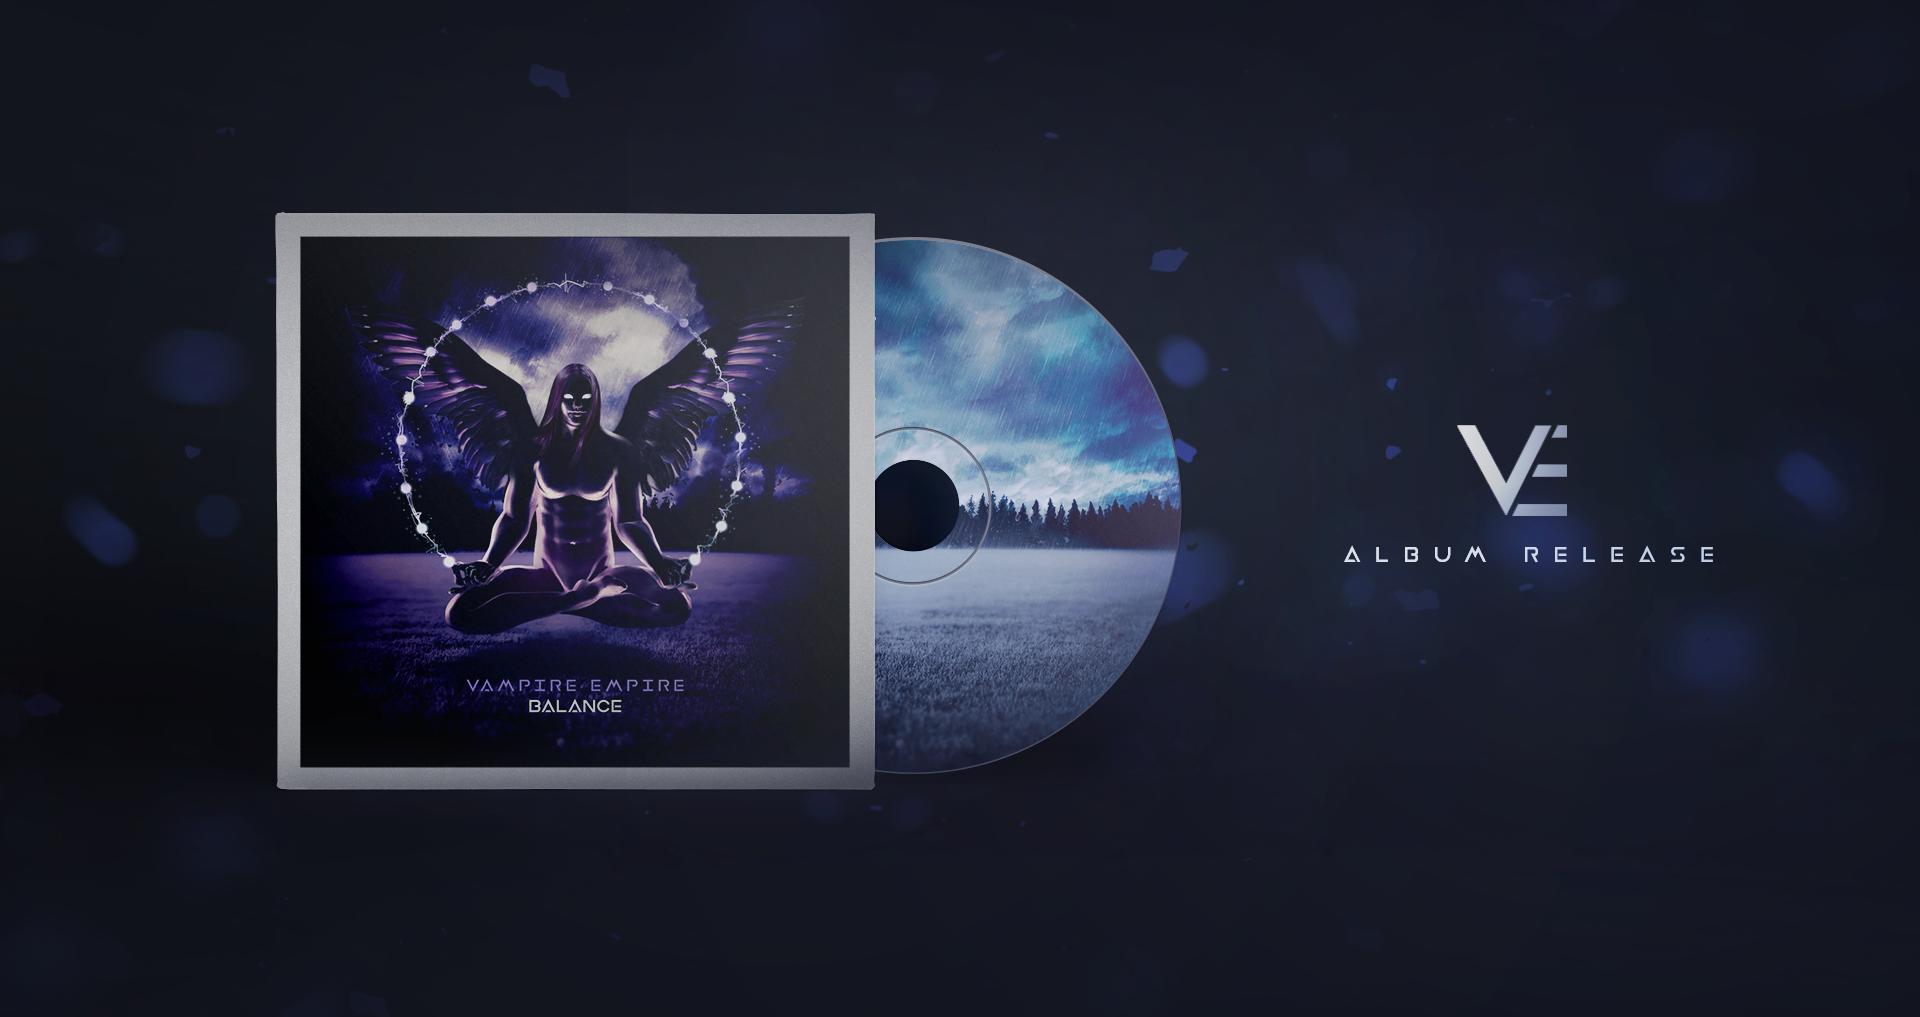 Vampire Empire - Balance - Album Release Cover